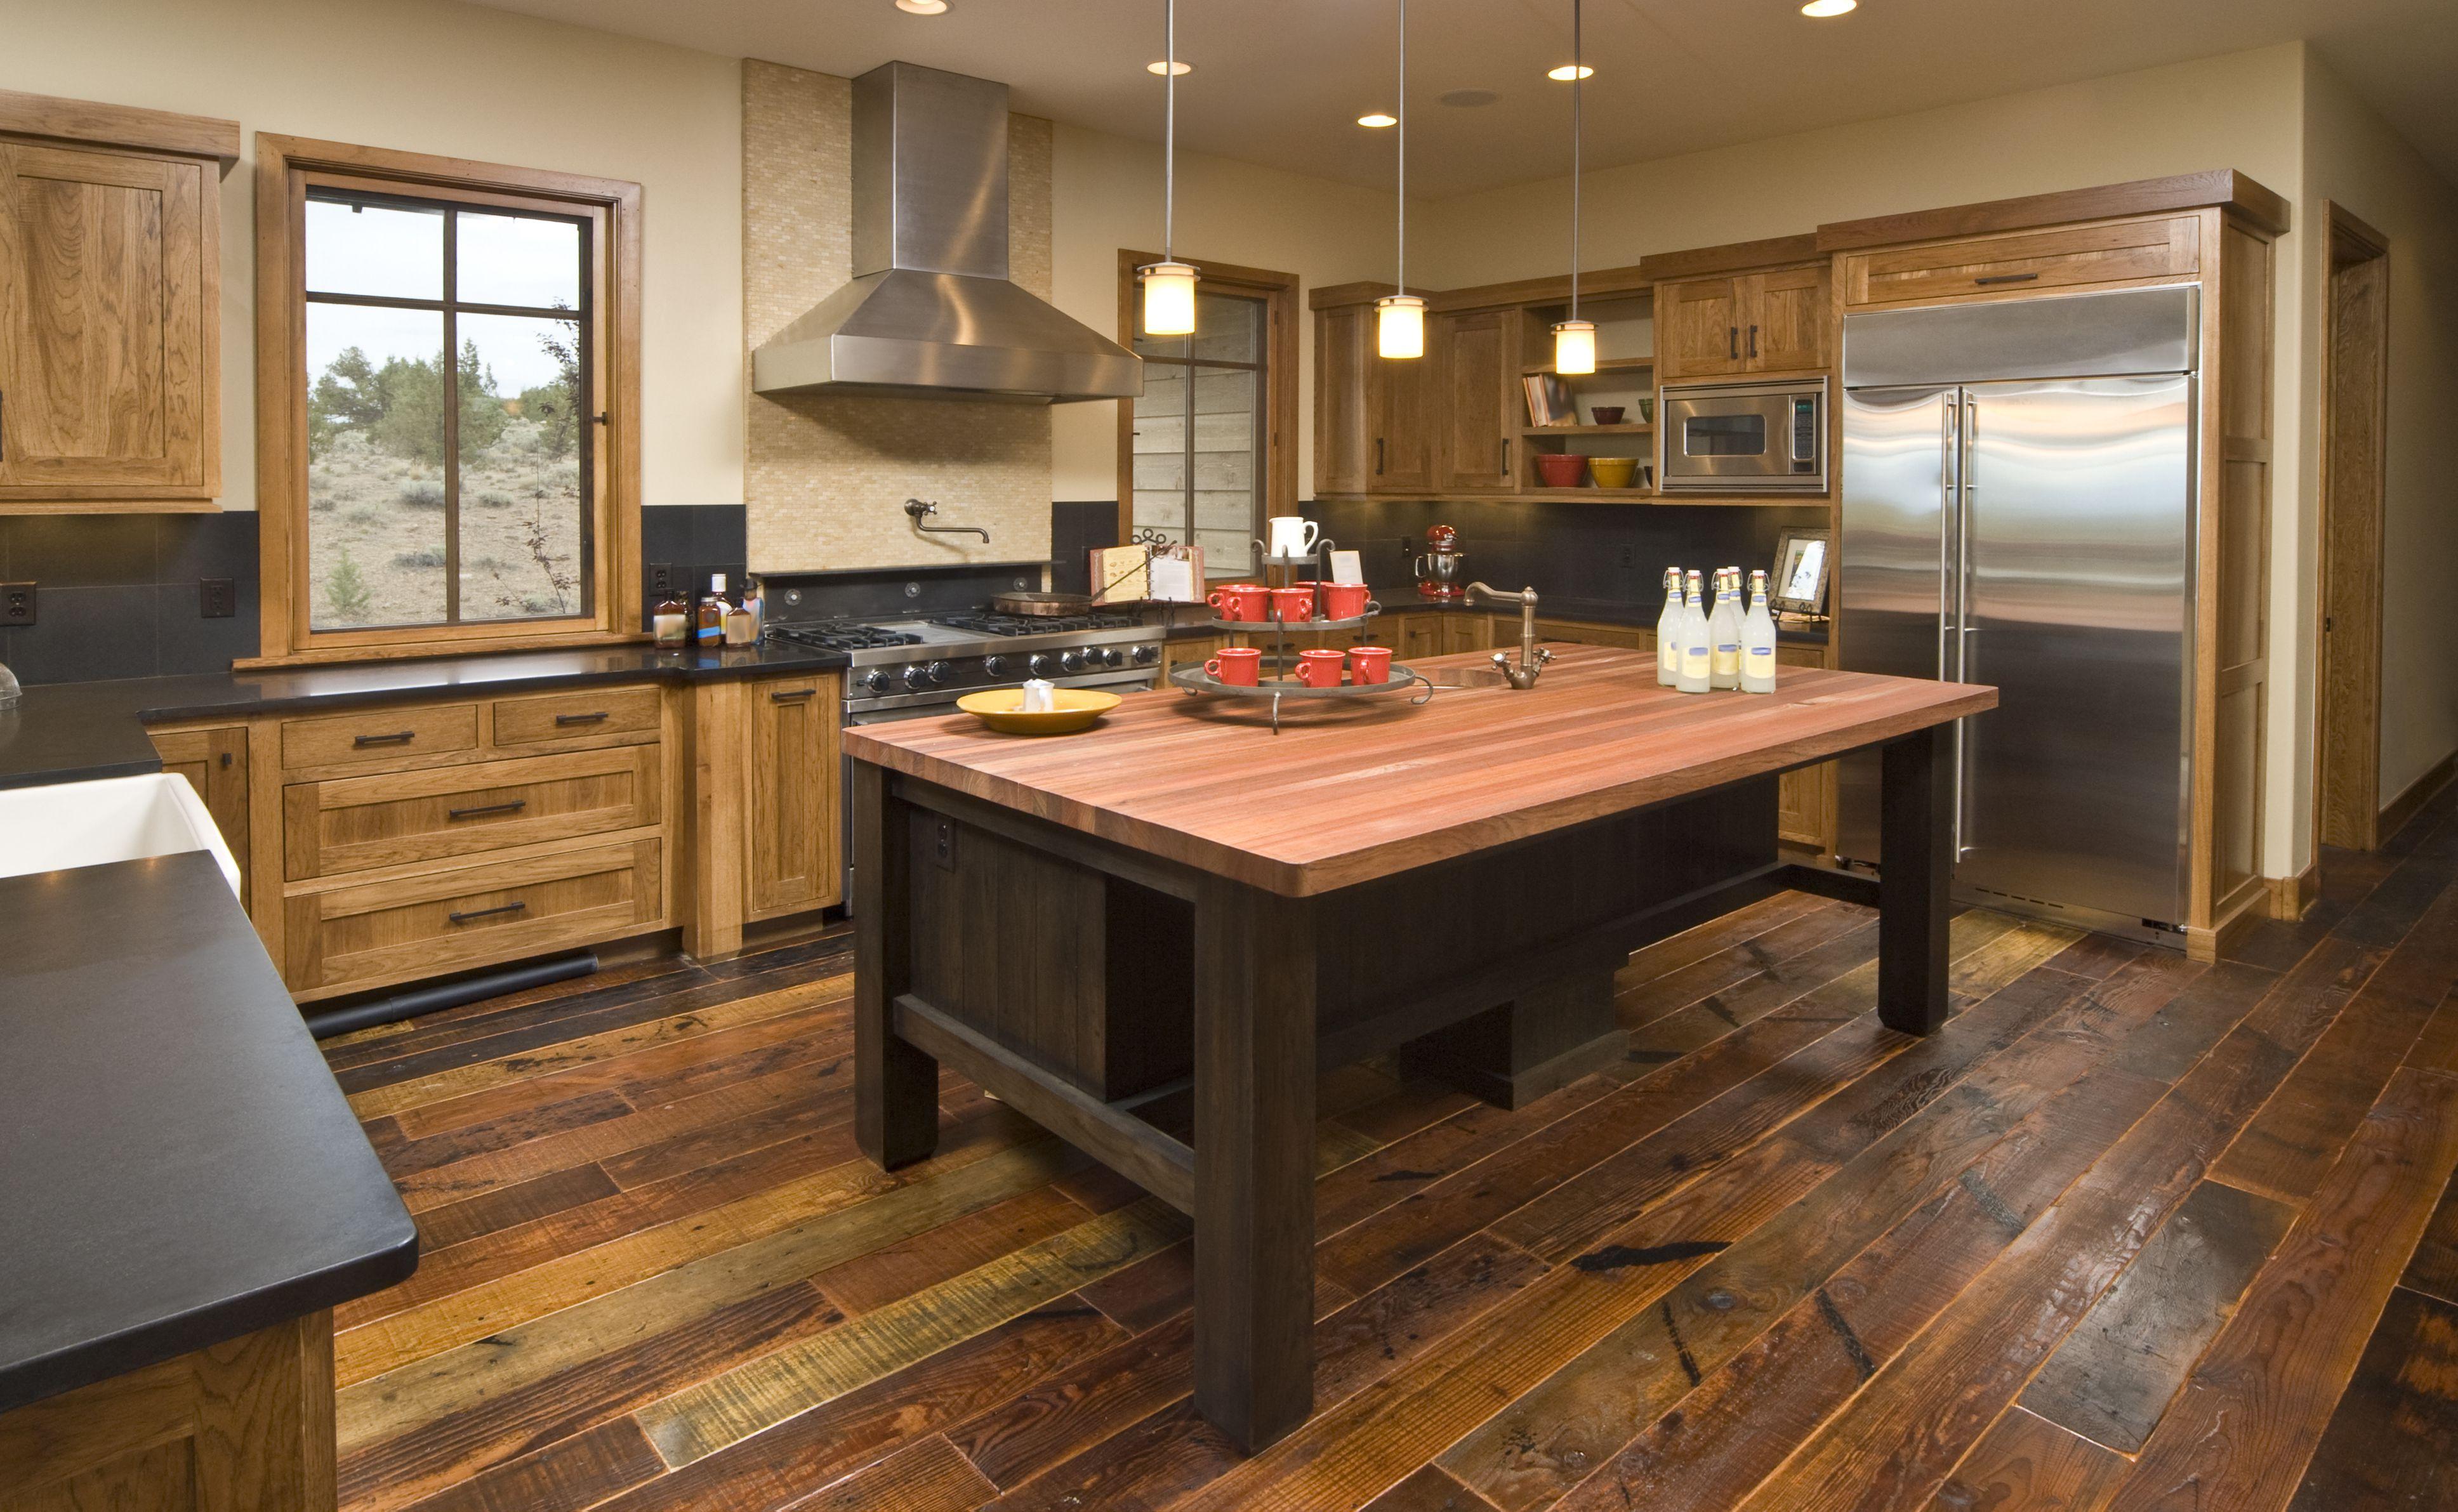 exclusive jordan istoria floor bespoke andrews original grade rustic wood range flooring